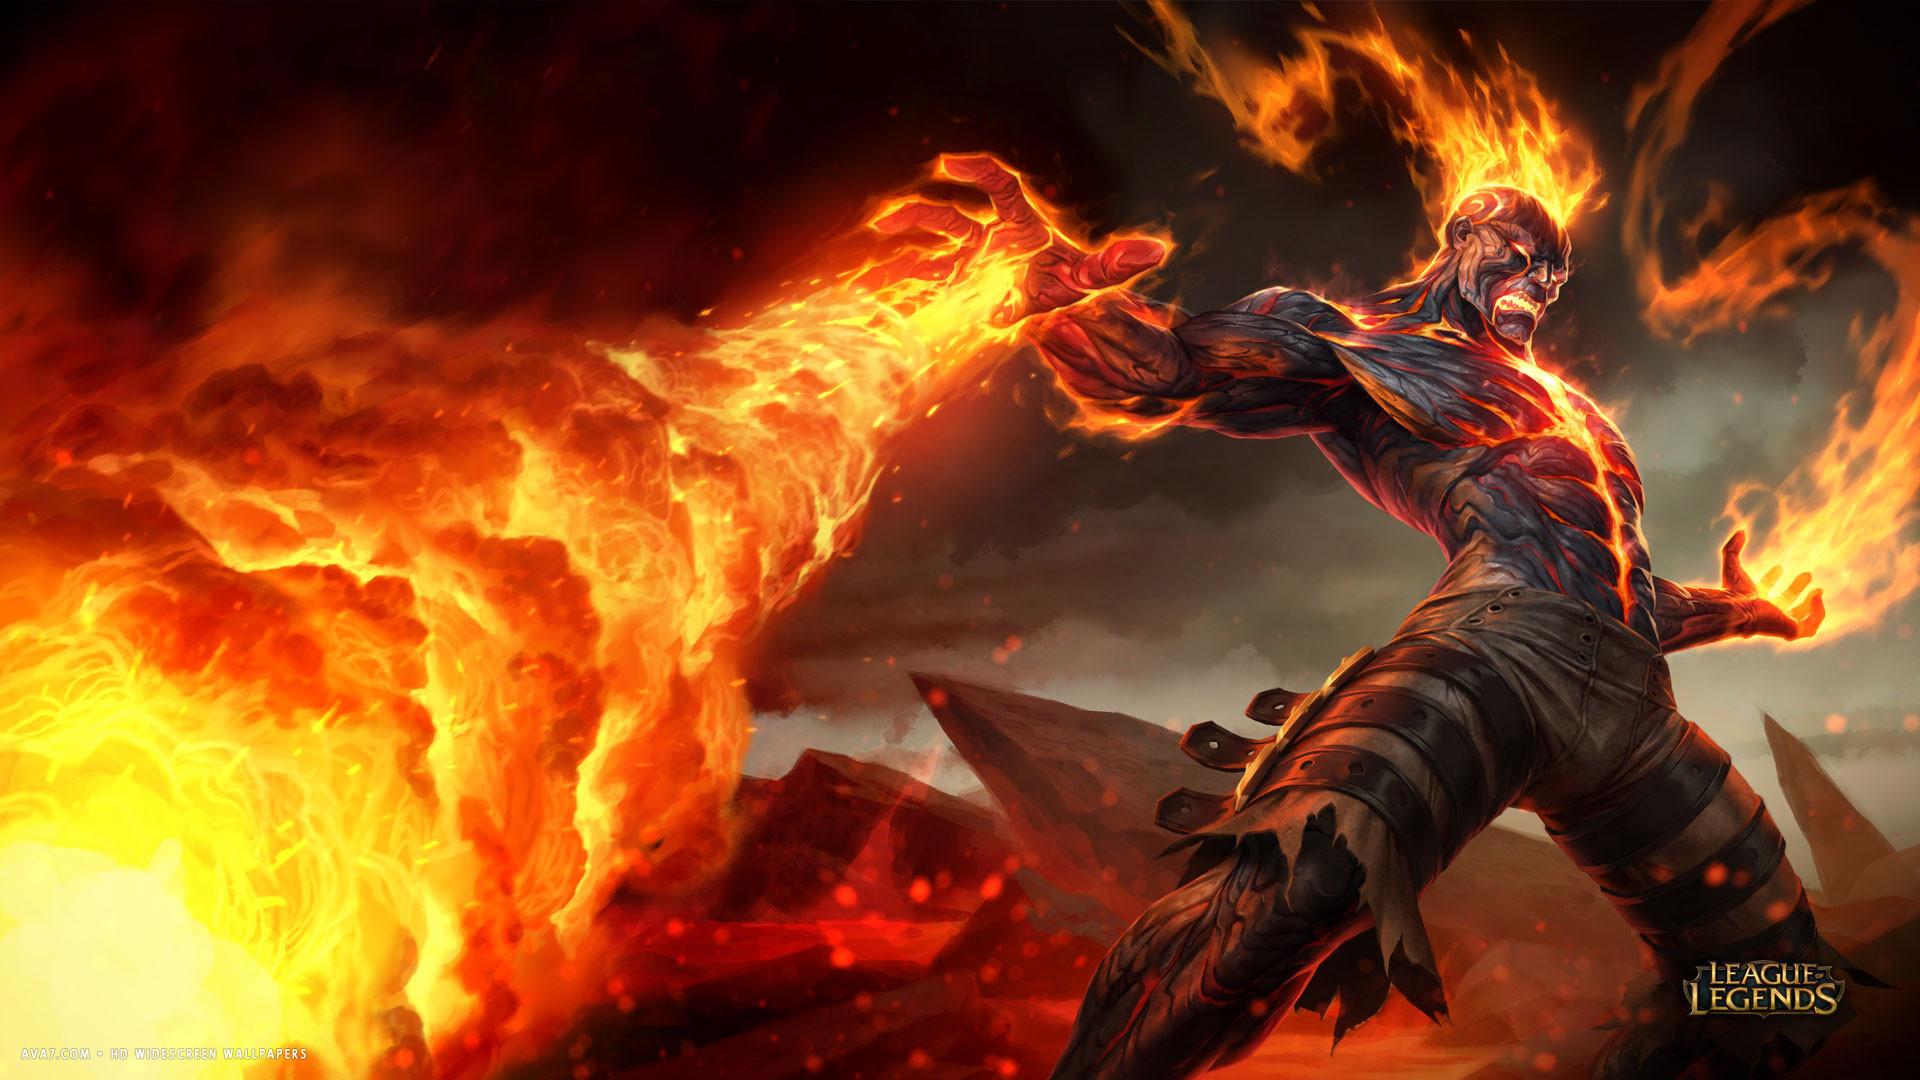 … league of legends game lol brand fire flames magic